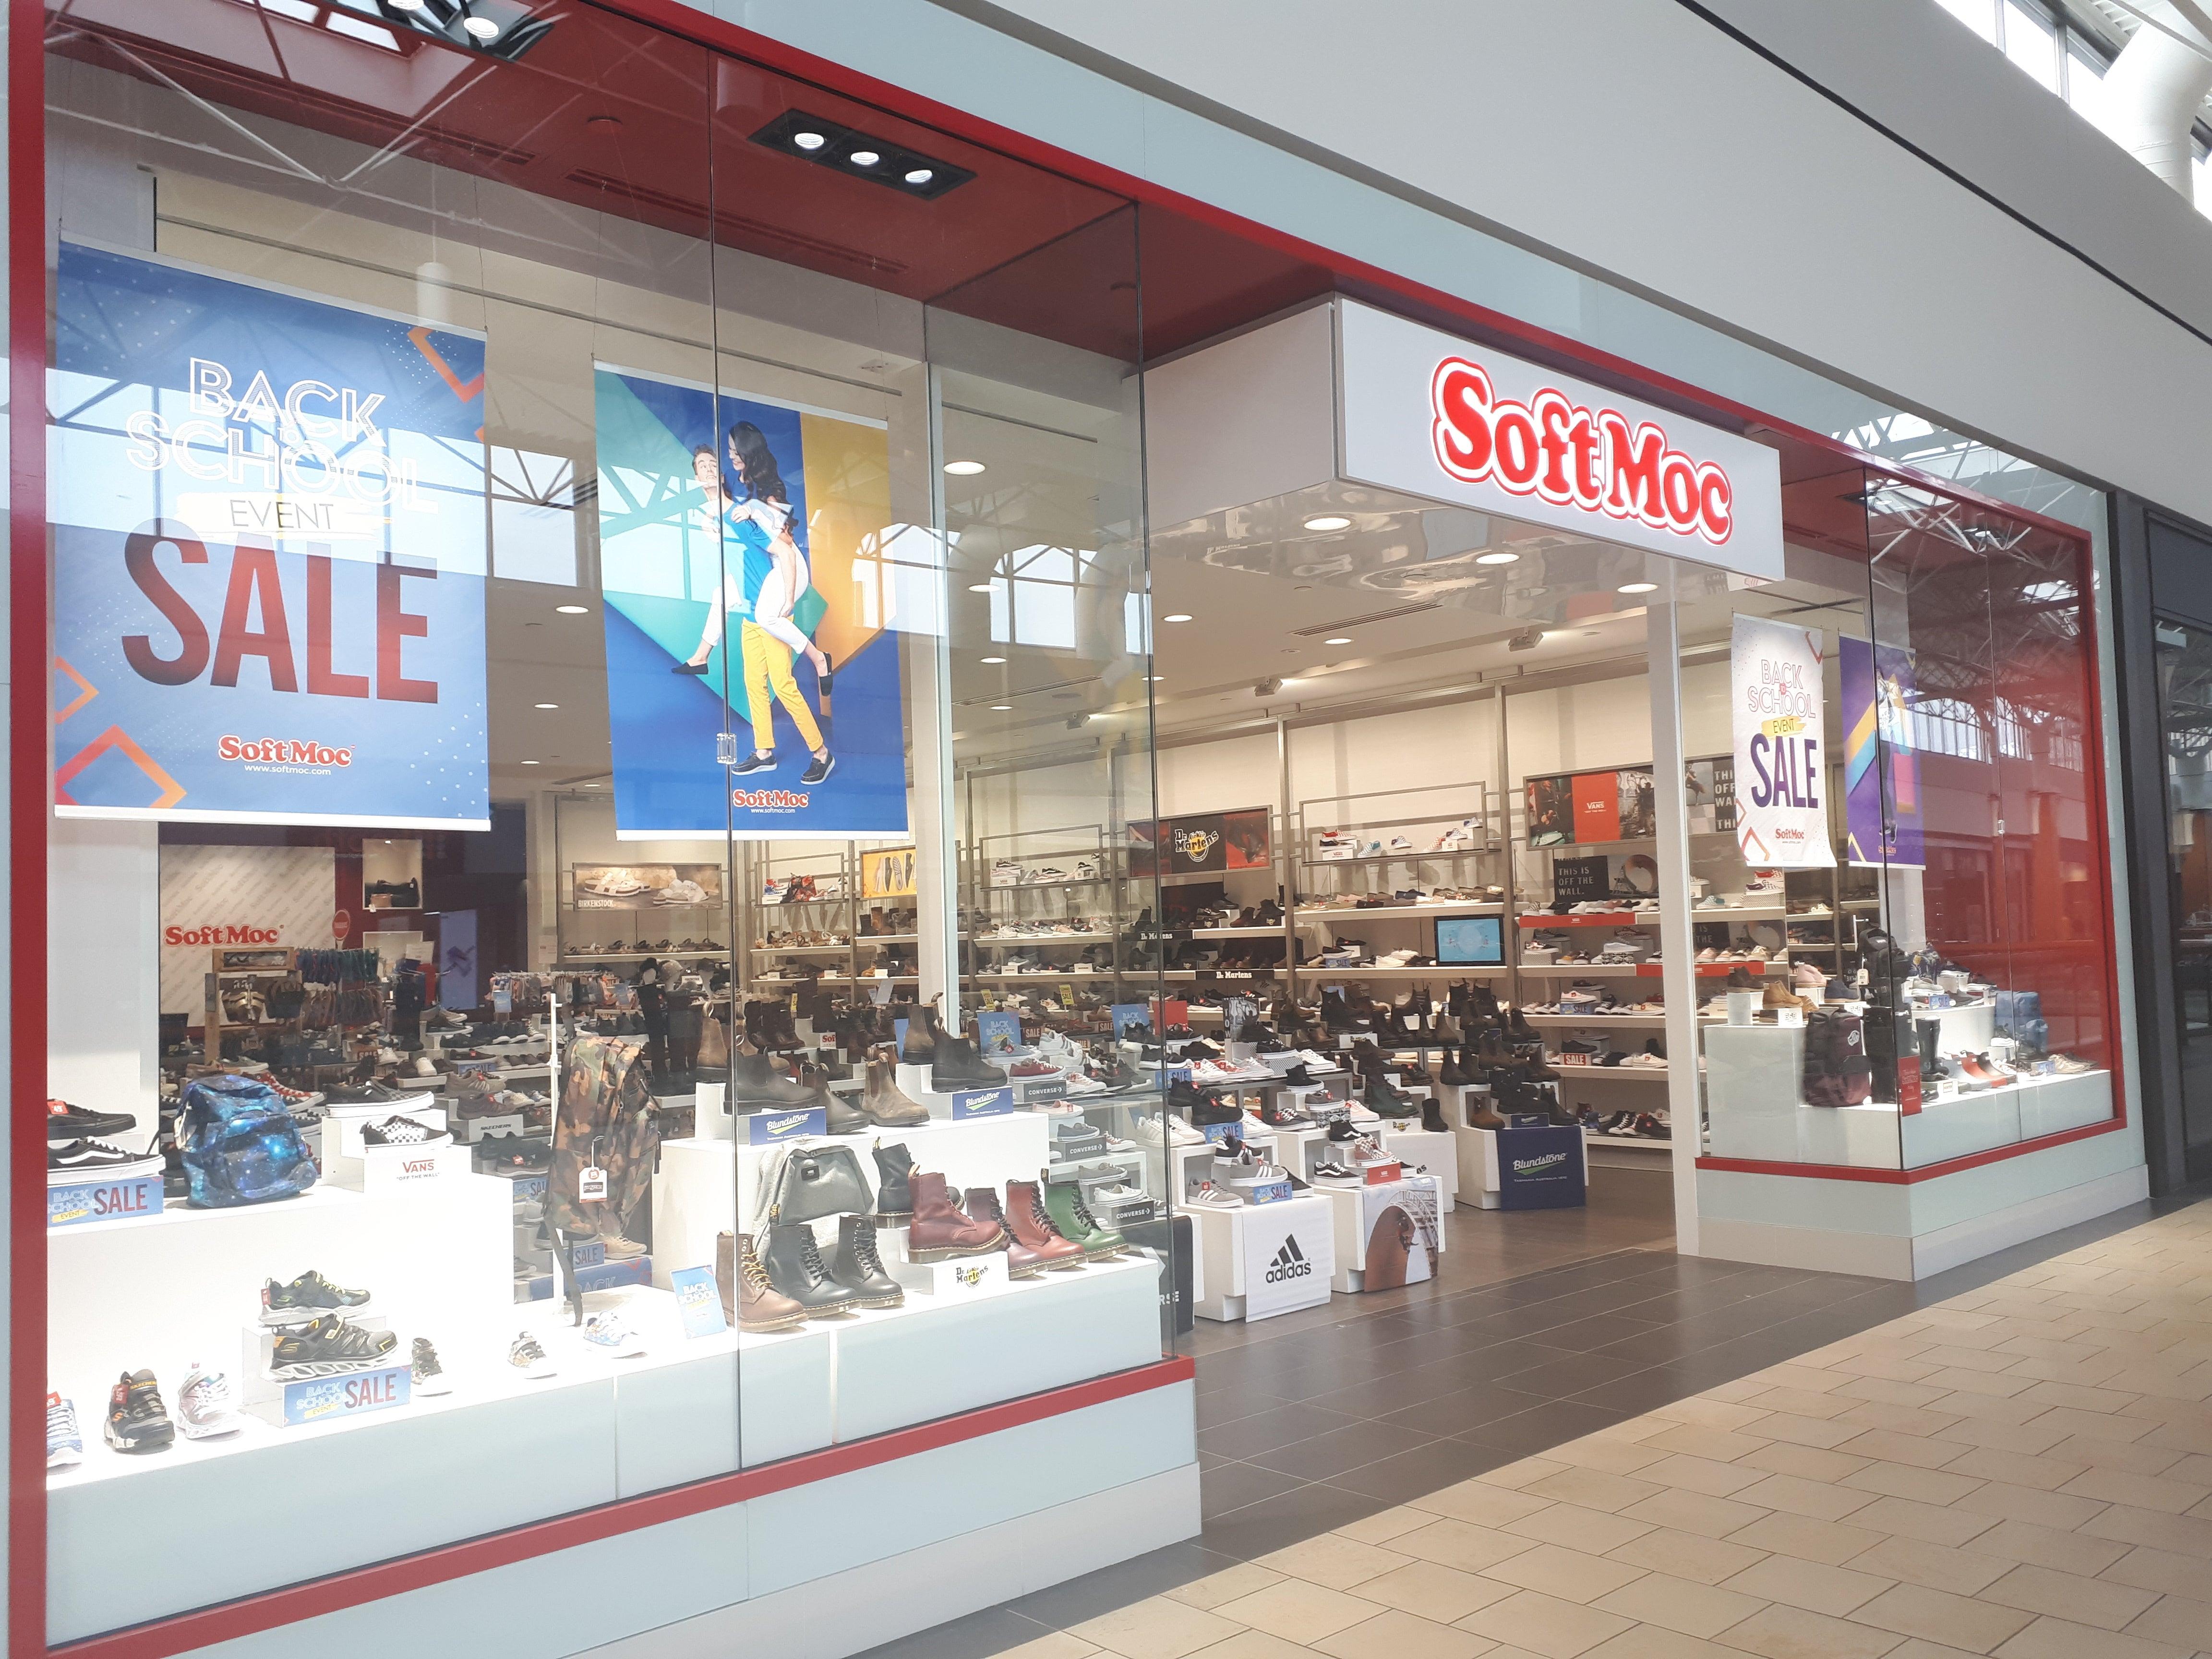 SoftMoc Lime Ridge Mall